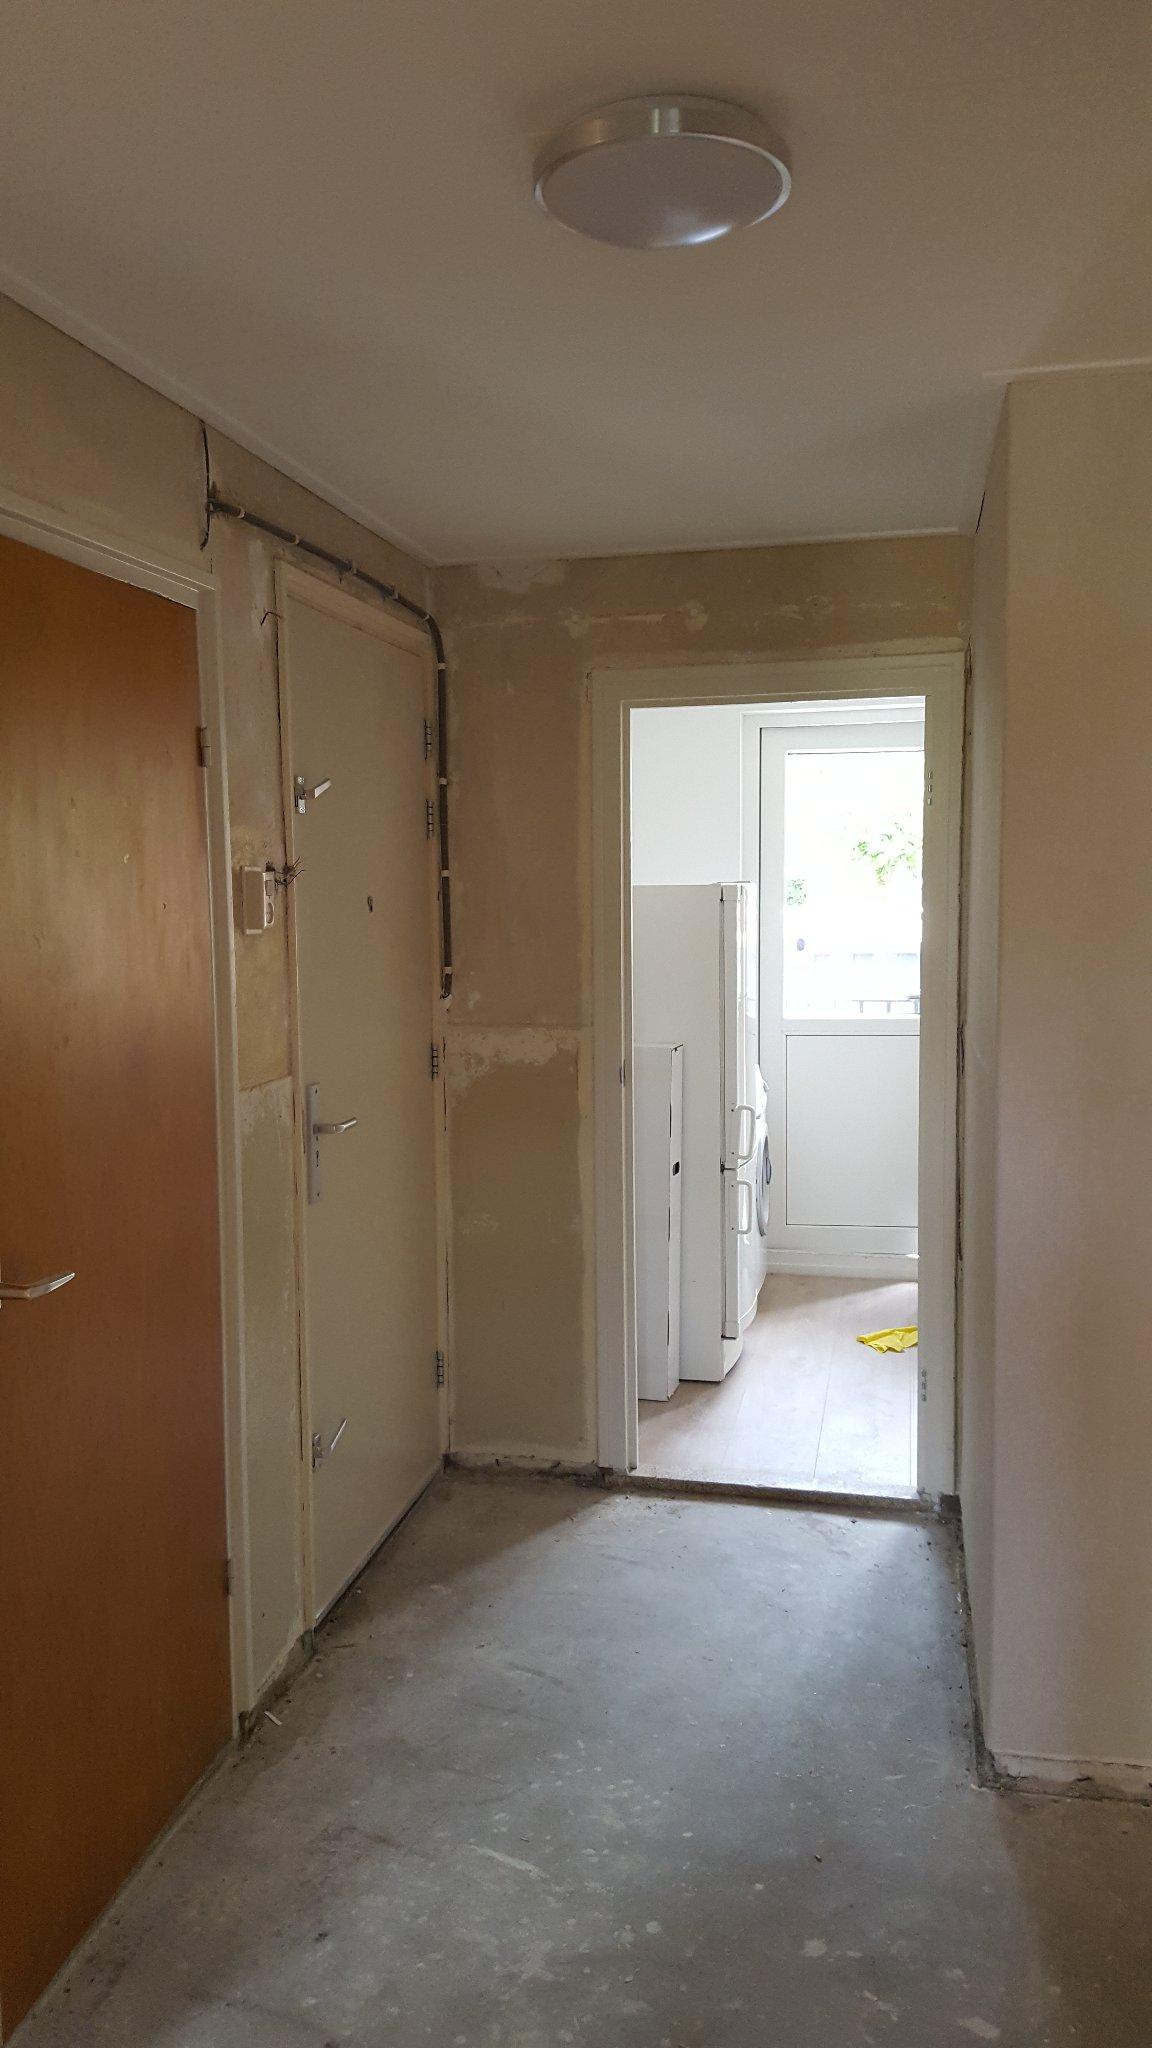 3 kamers behangen en binnen schilderwerk werkspot for Trapgat behangen